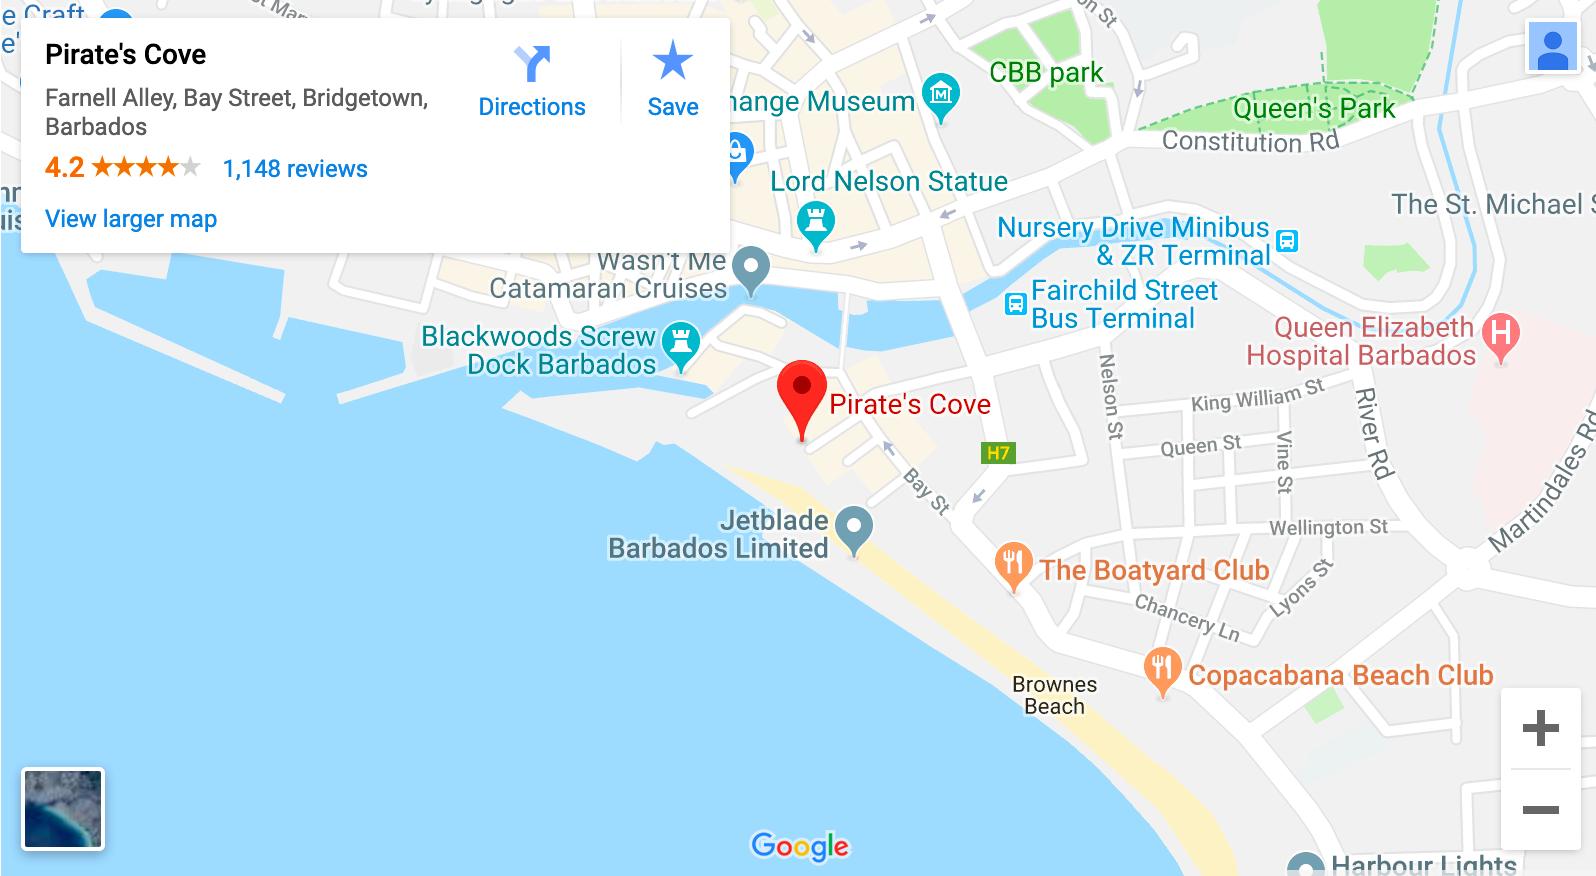 Pirate's Cove, Carlisle Bay, Barbados Map